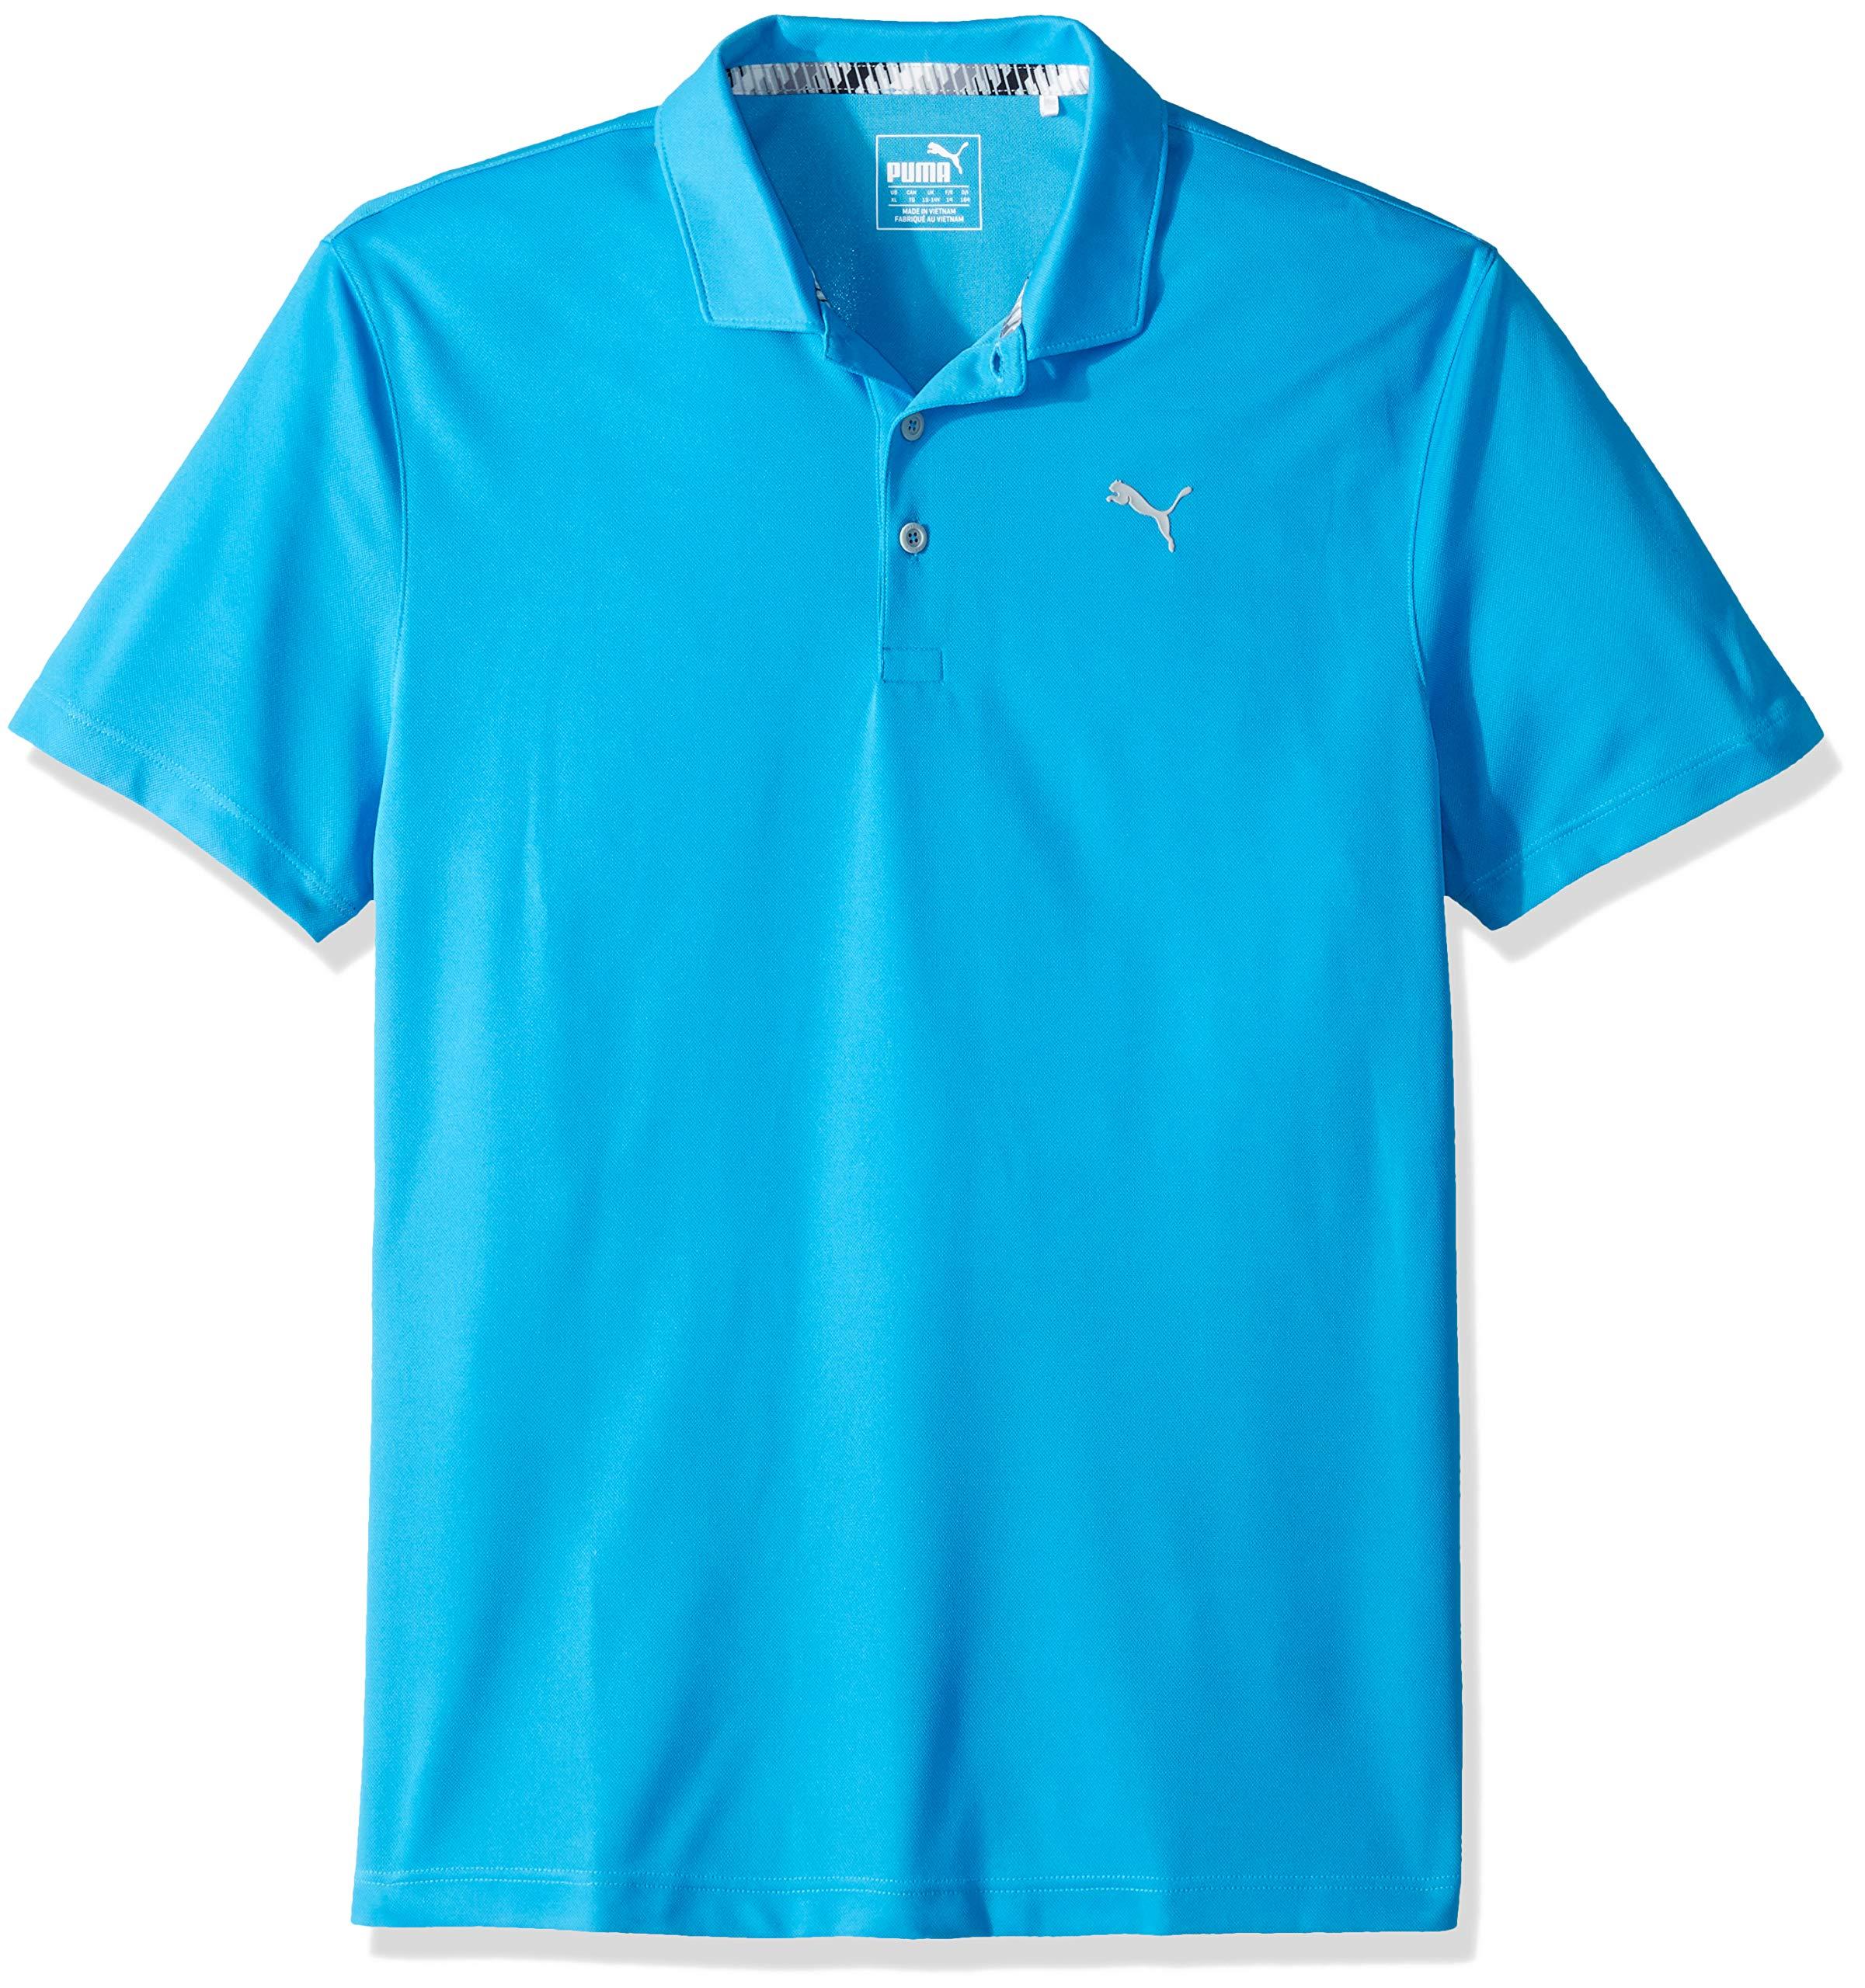 Puma Golf Boys 2019 Polo, Bleu Azure, x Small